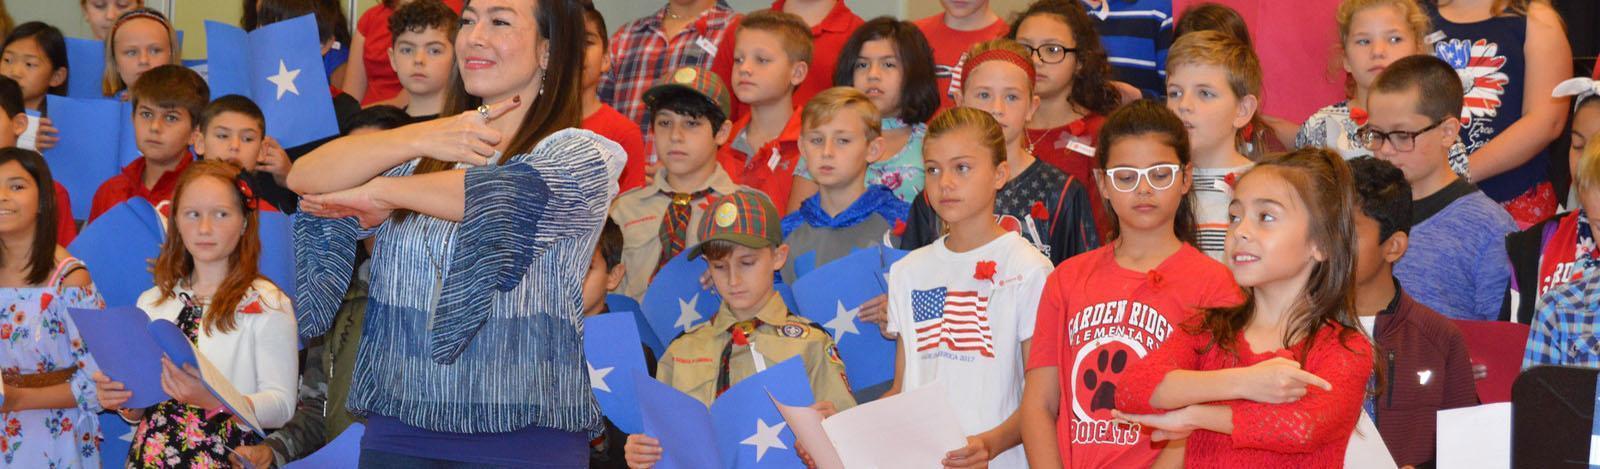 kids singing at veterans day performance